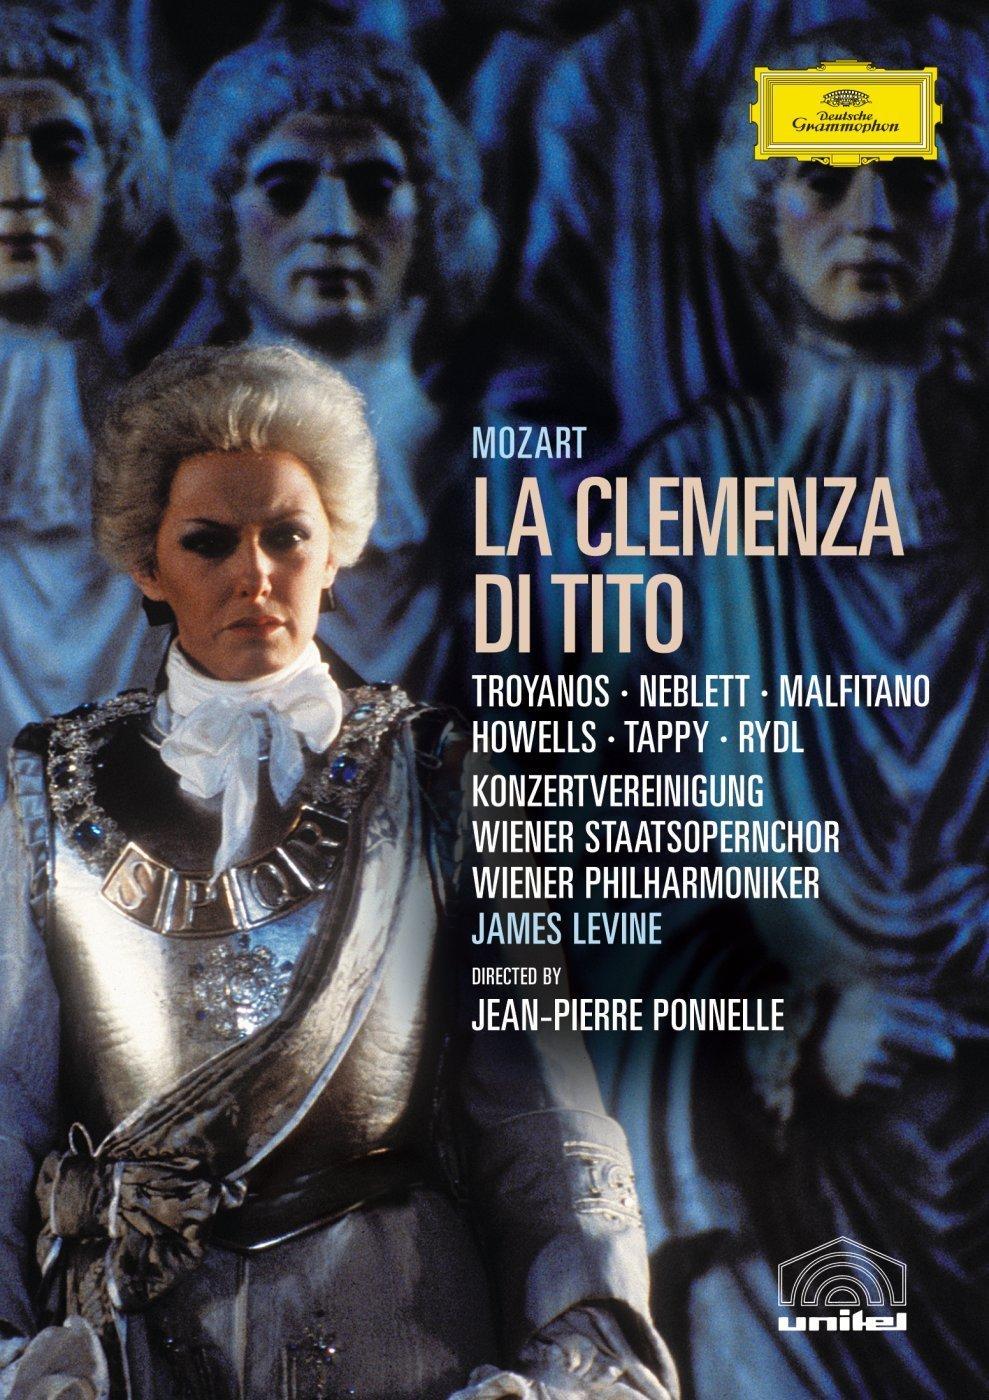 James Levine. Mozart: La Clemenza Di Tito strauss james levine elektra